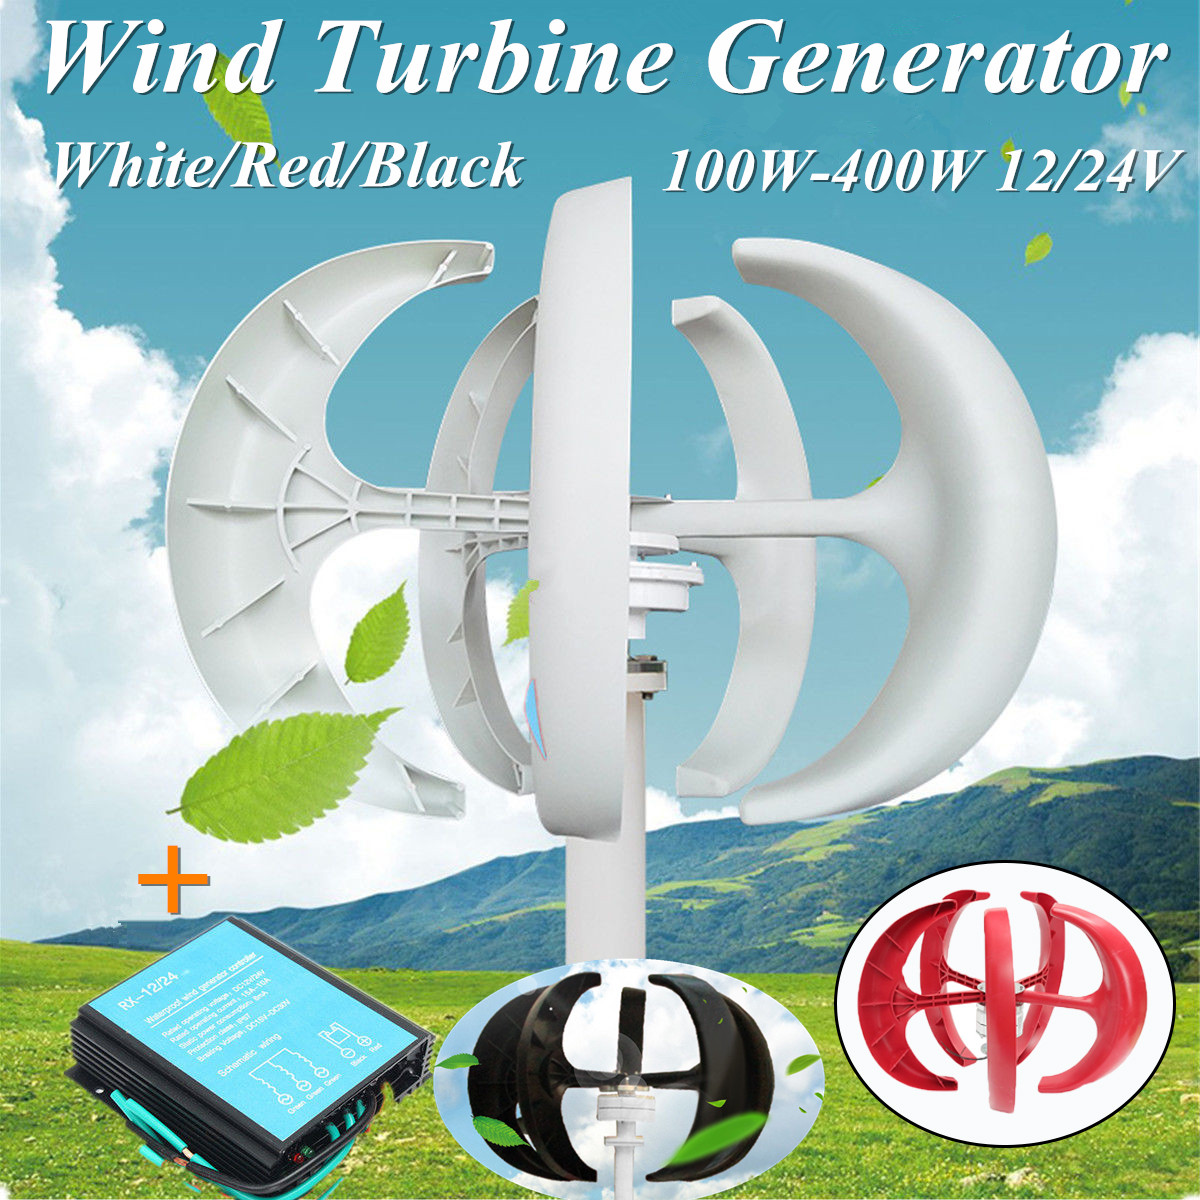 100W 200W 300W 400W Wind Generator Lantern 12V 24V 5 Blades Permanent Magnet Generator T urb ine + 600W Wind Controller 24V100W 200W 300W 400W Wind Generator Lantern 12V 24V 5 Blades Permanent Magnet Generator T urb ine + 600W Wind Controller 24V